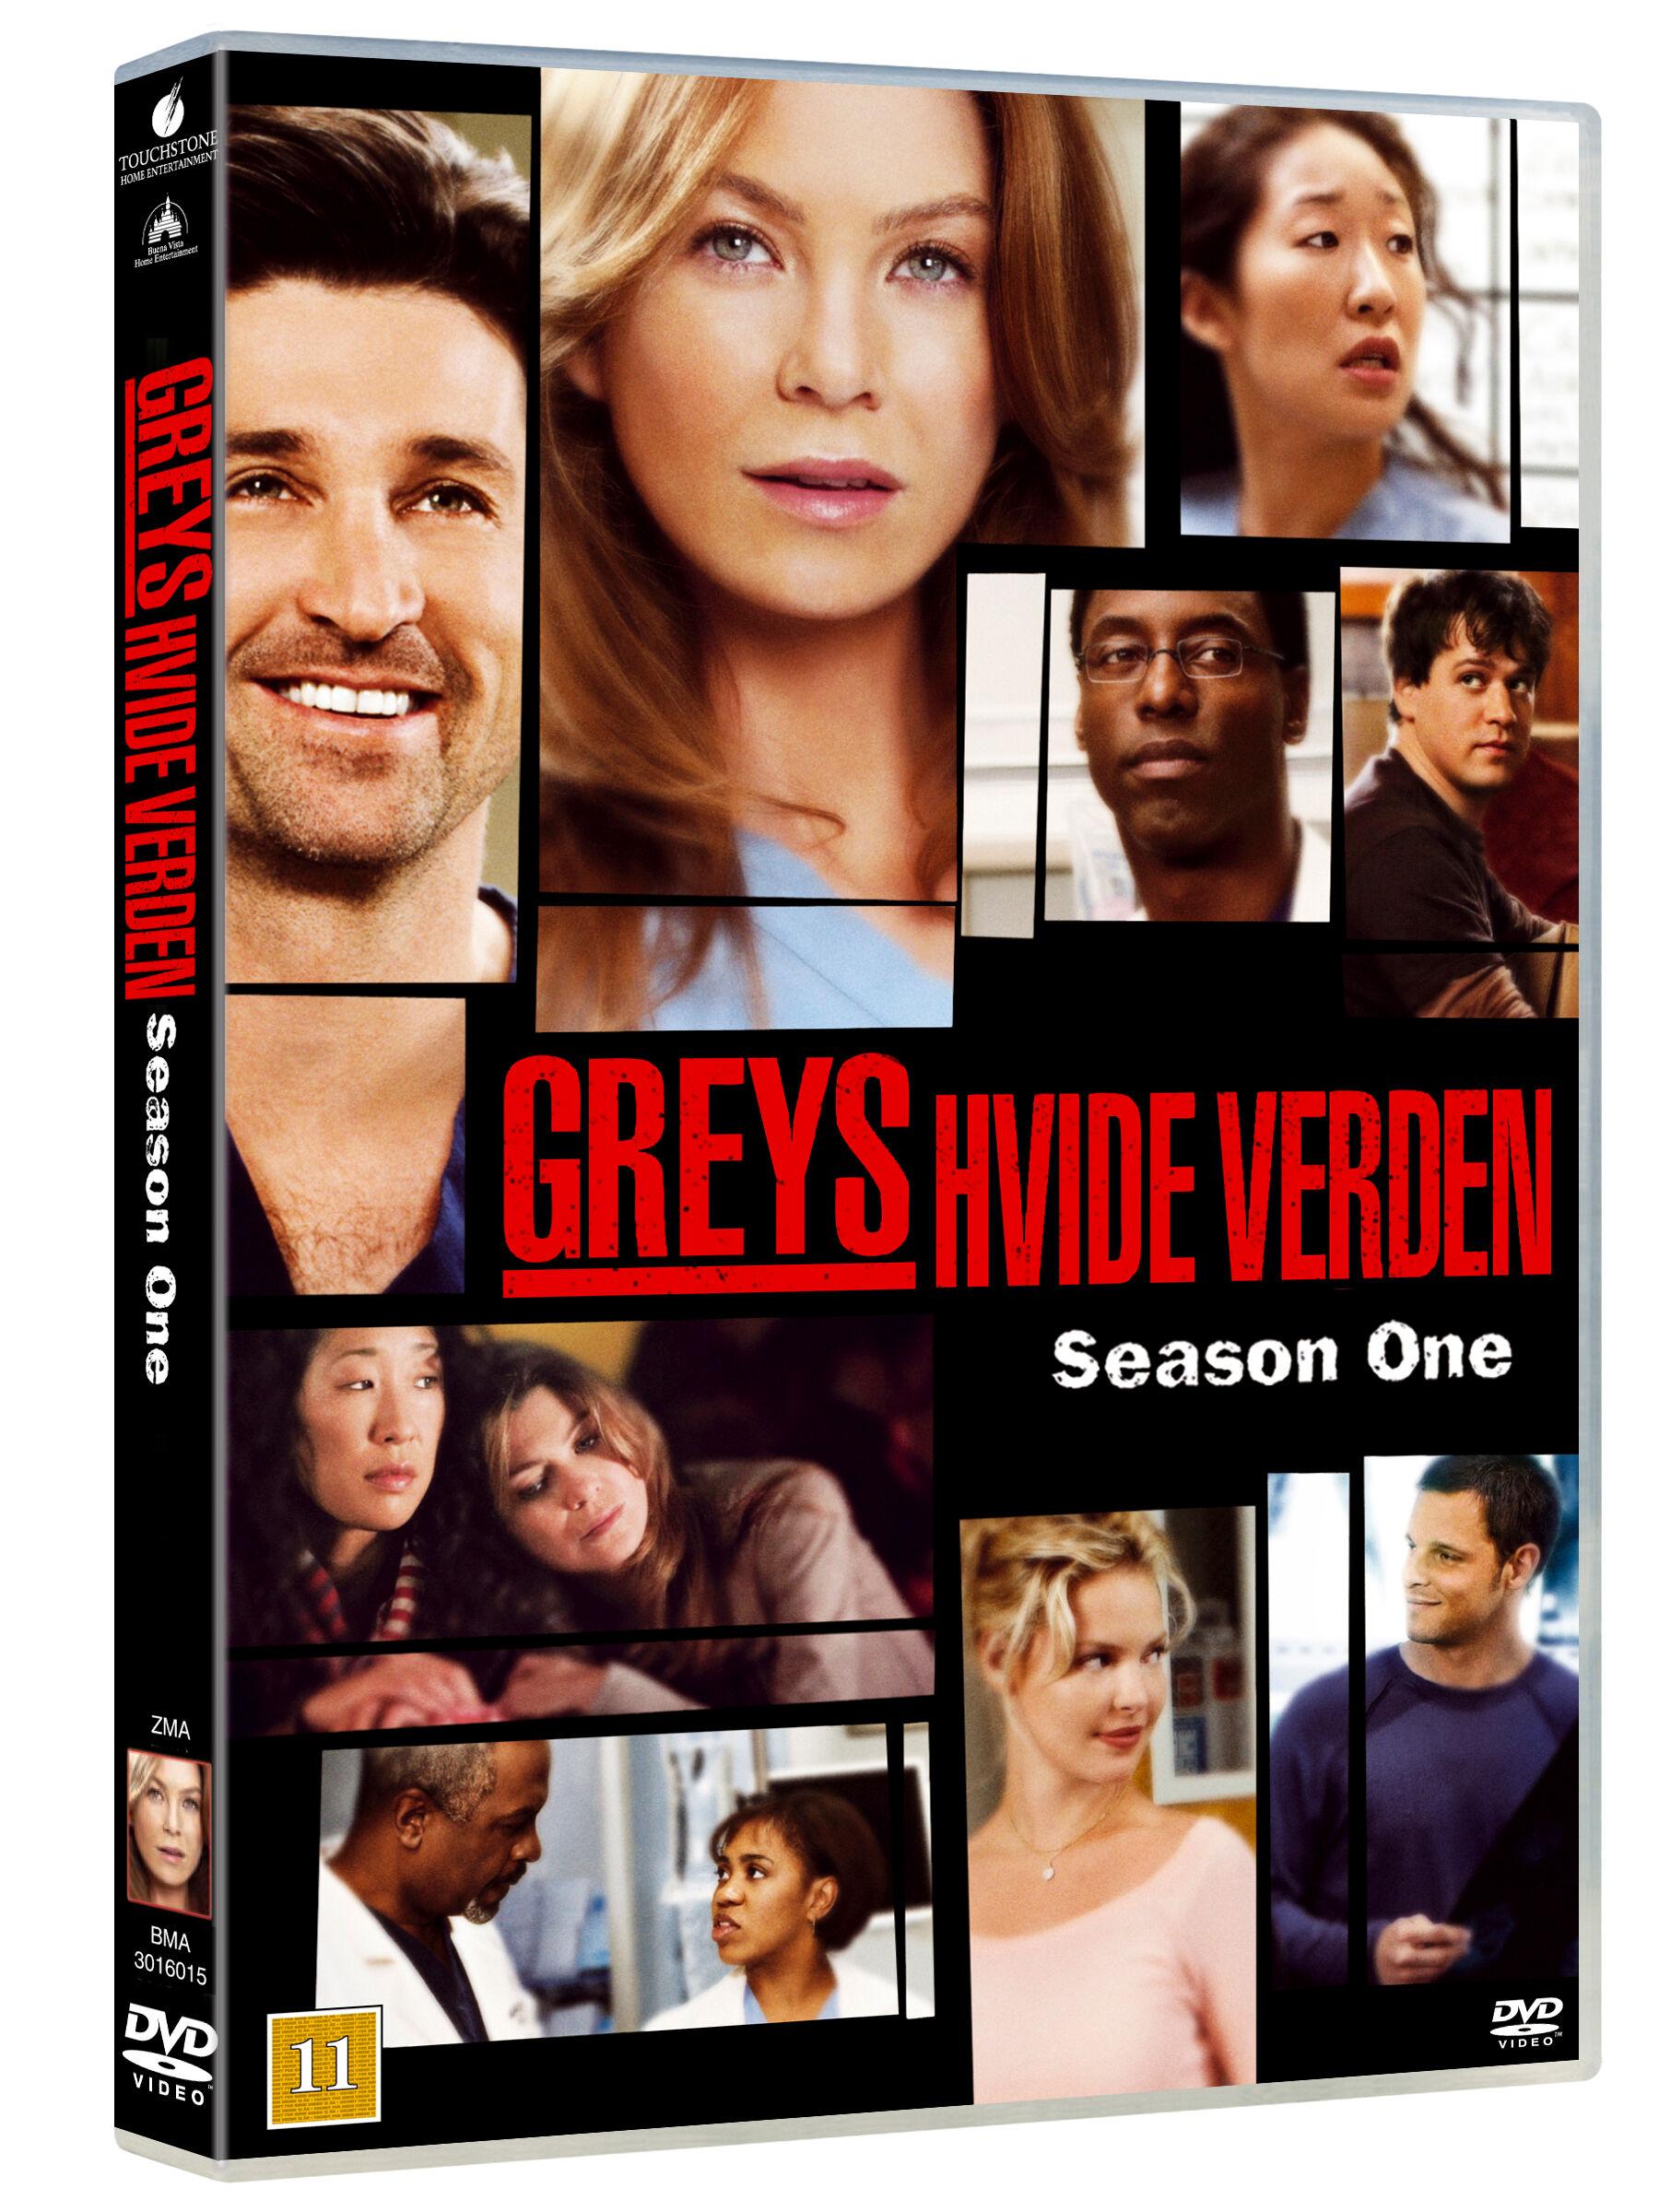 Greys Anatomy/Greys Hvide Verden saeson 1 DVD